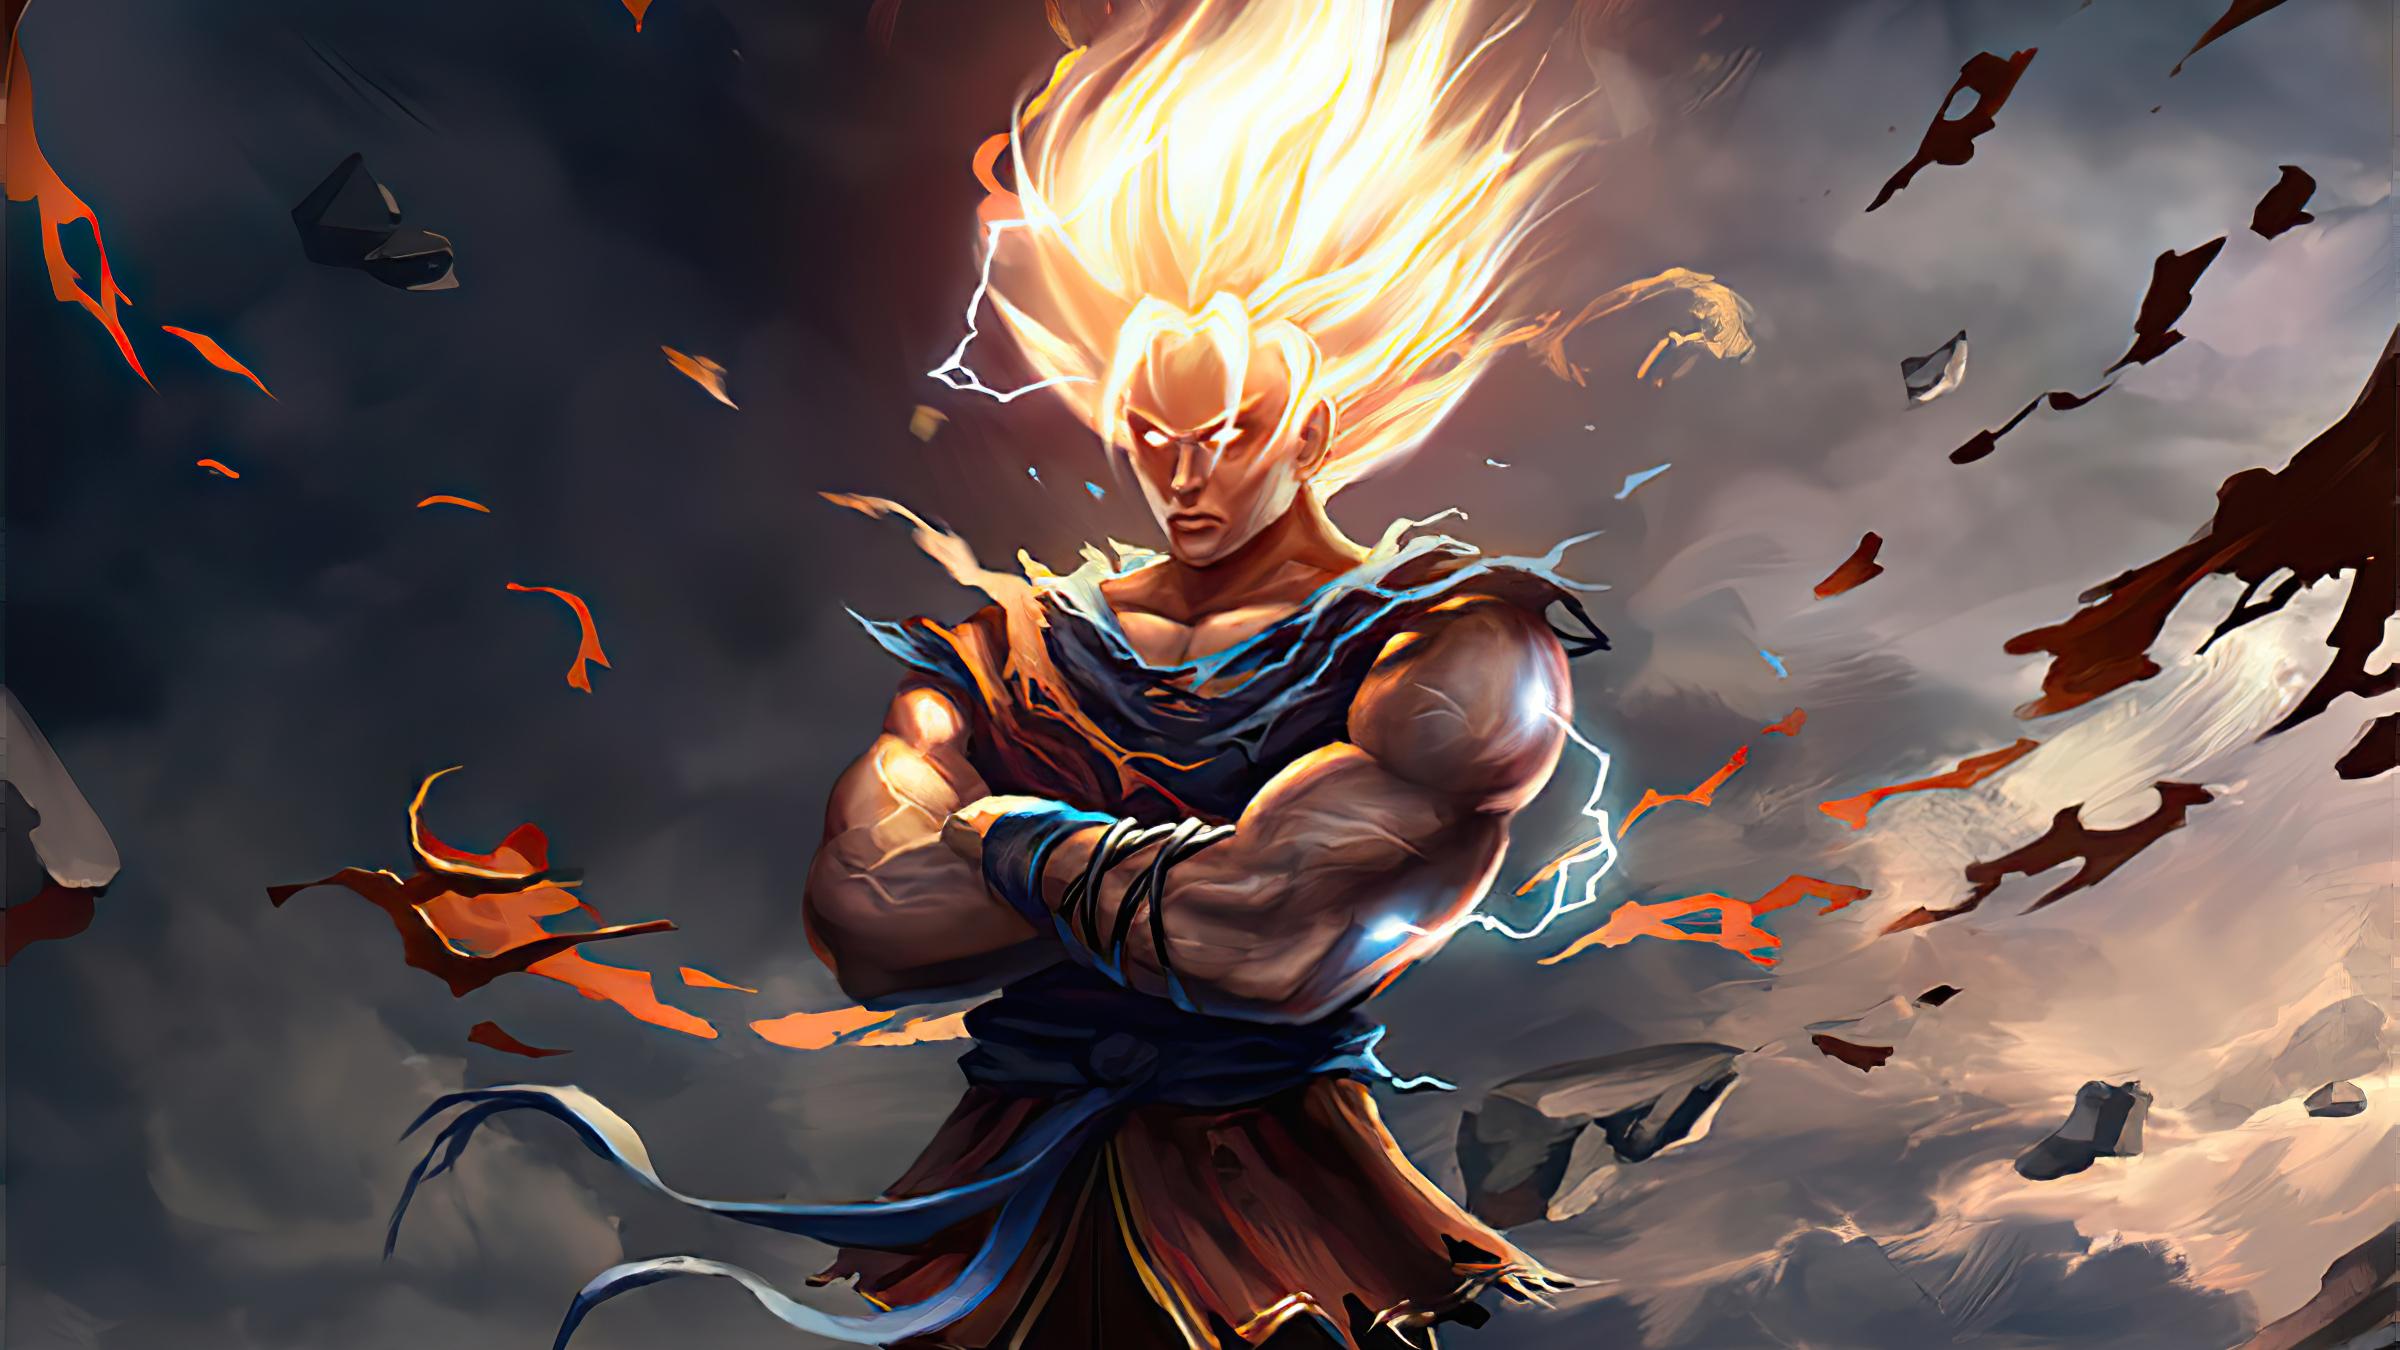 3840x2160 Goku New Dragon Ball Z Art 4K Wallpaper, HD ...